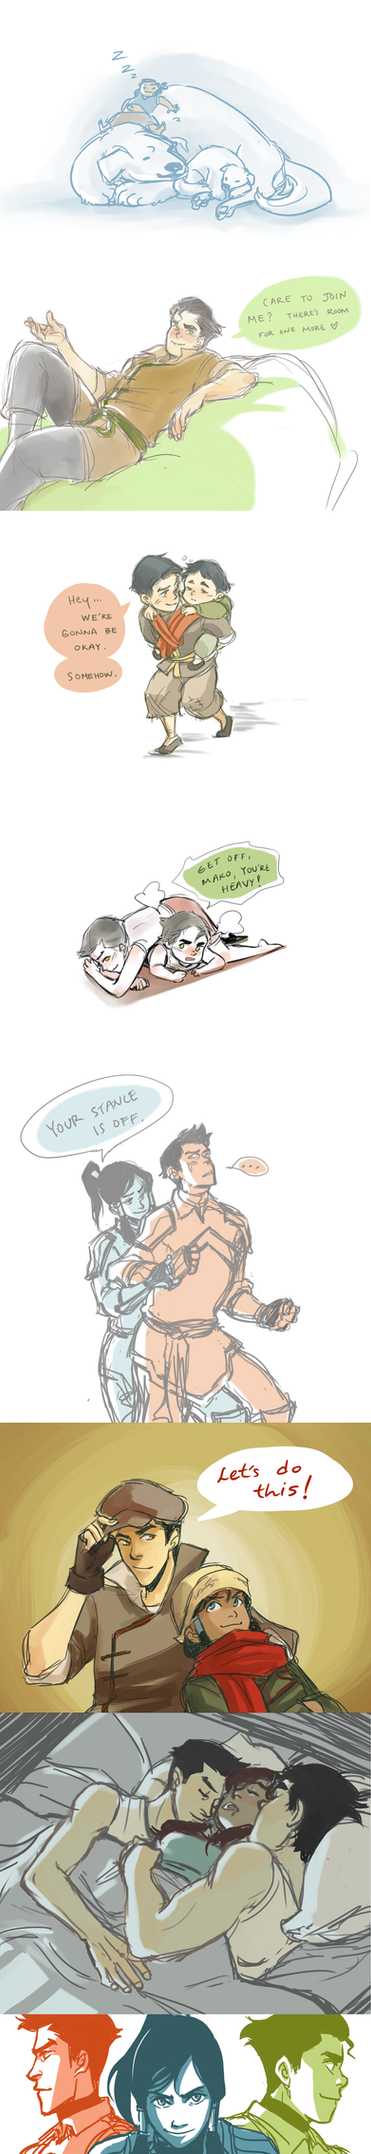 Korra: sketch dump 2 by Minuiko